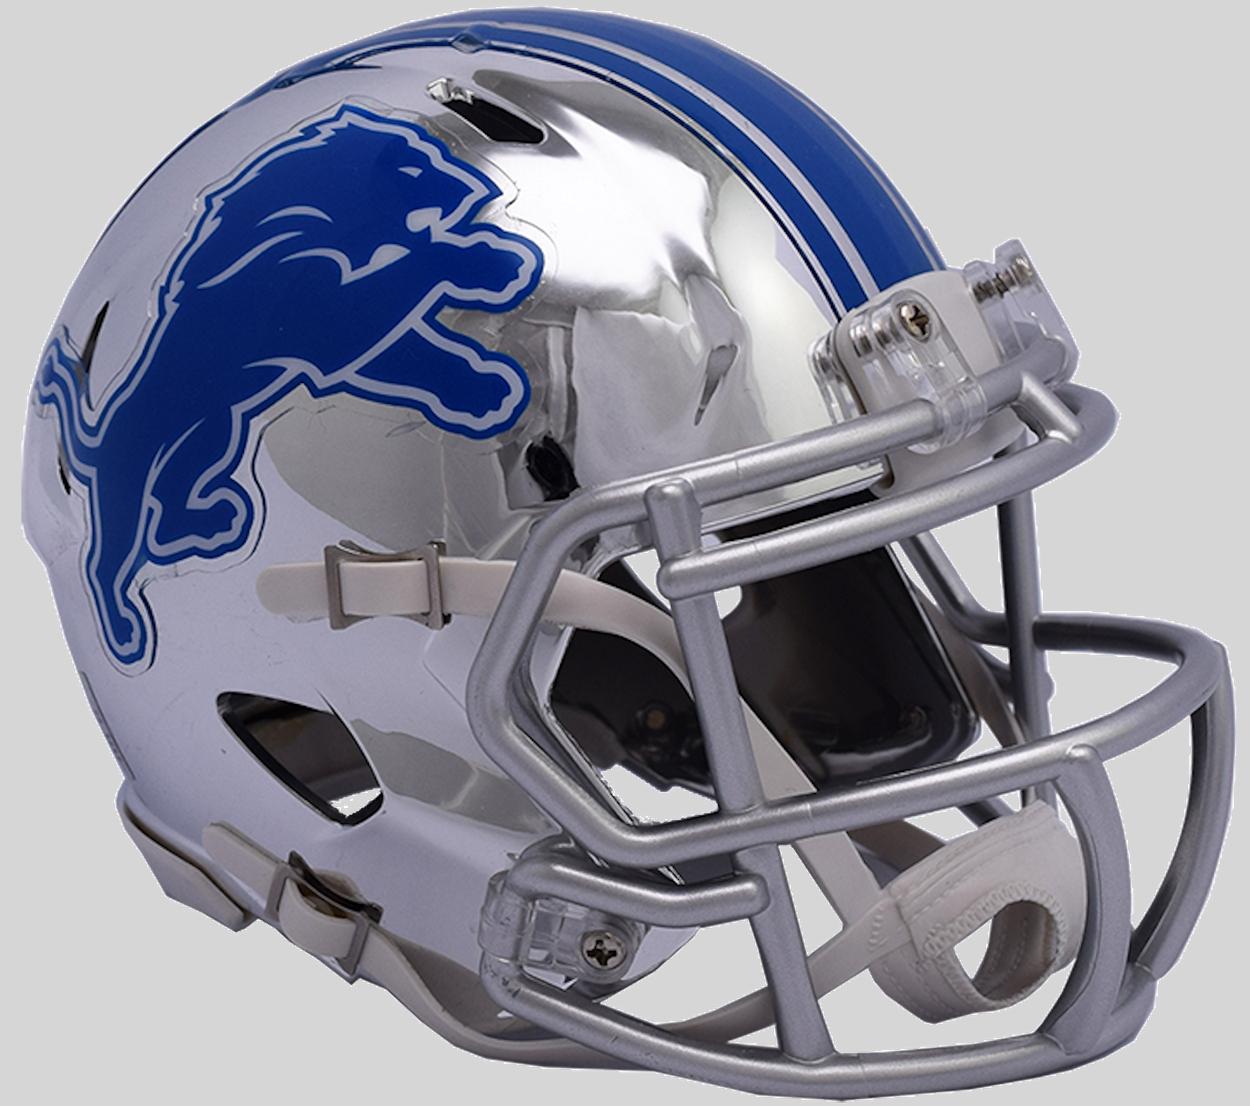 Detroit Lions NFL Mini Chrome Speed Football Helmet <B>NEW 2018</B>